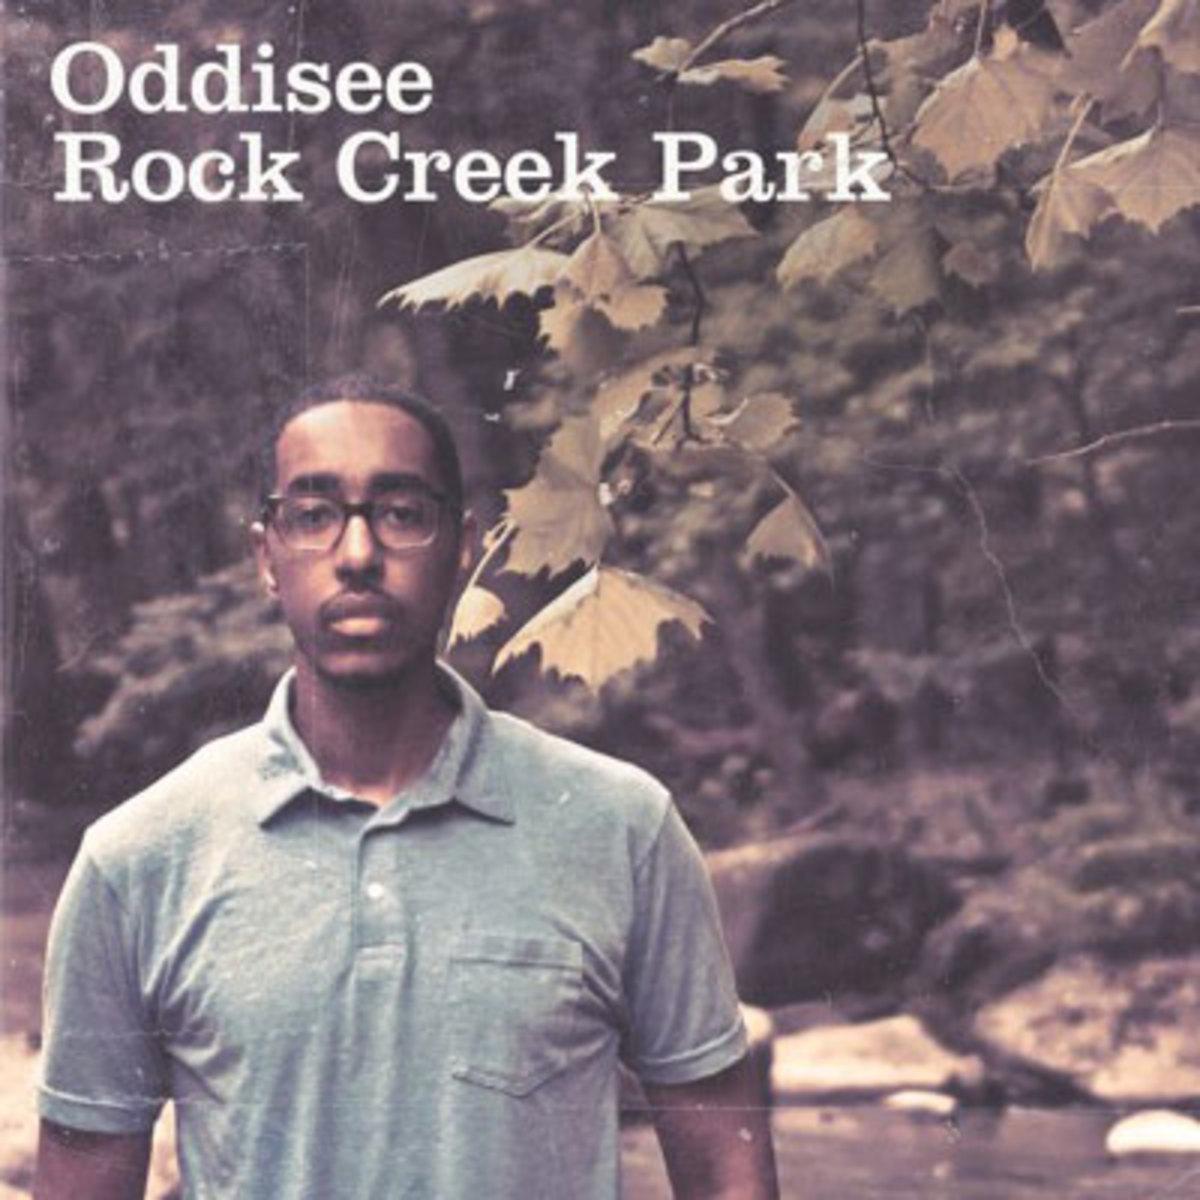 oddisee-rockcreek.jpg